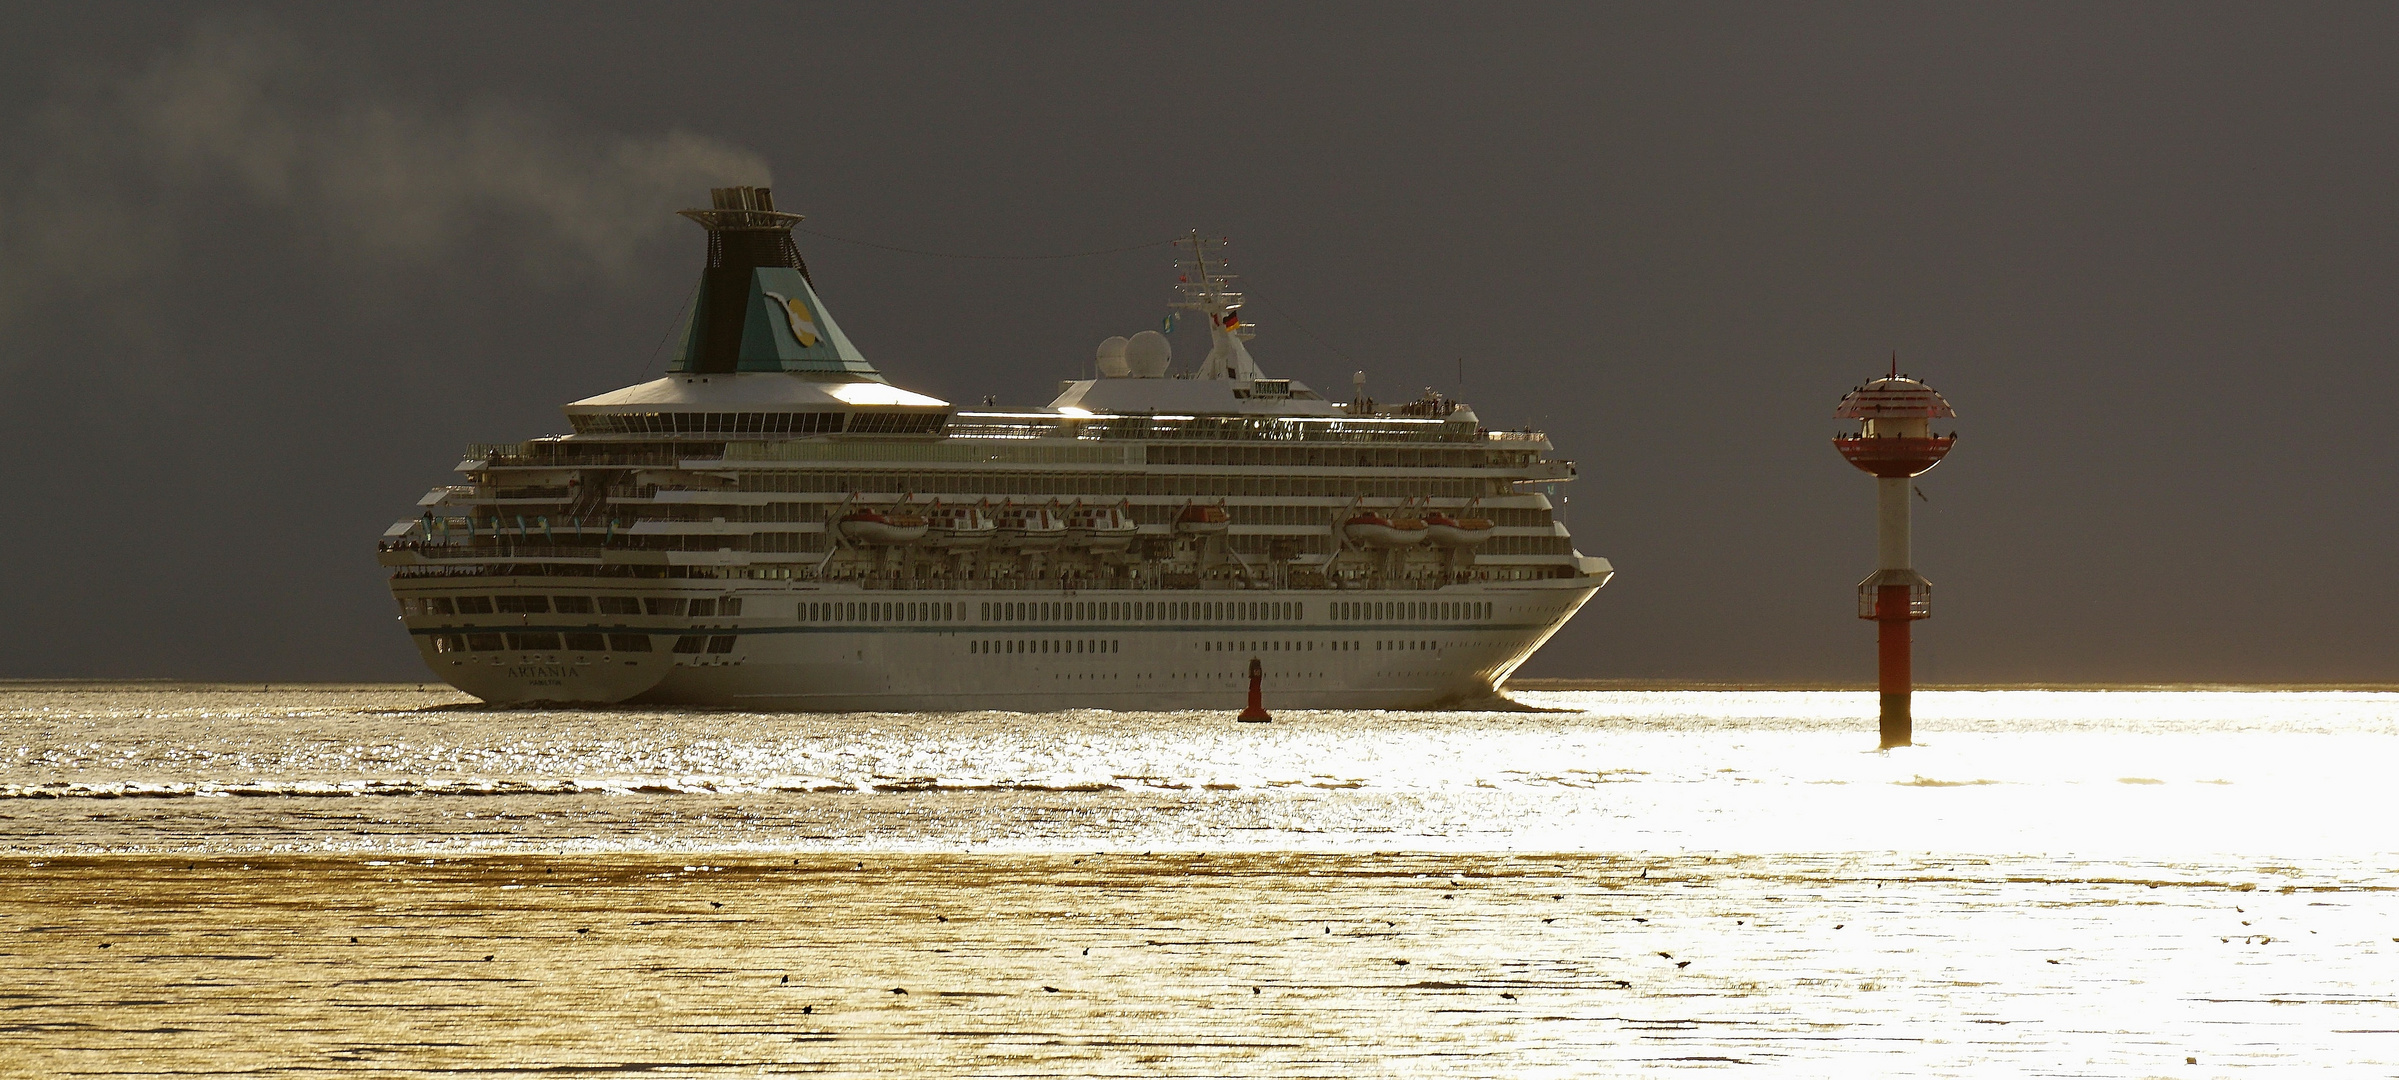 MS Artania verläßt Bremerhaven